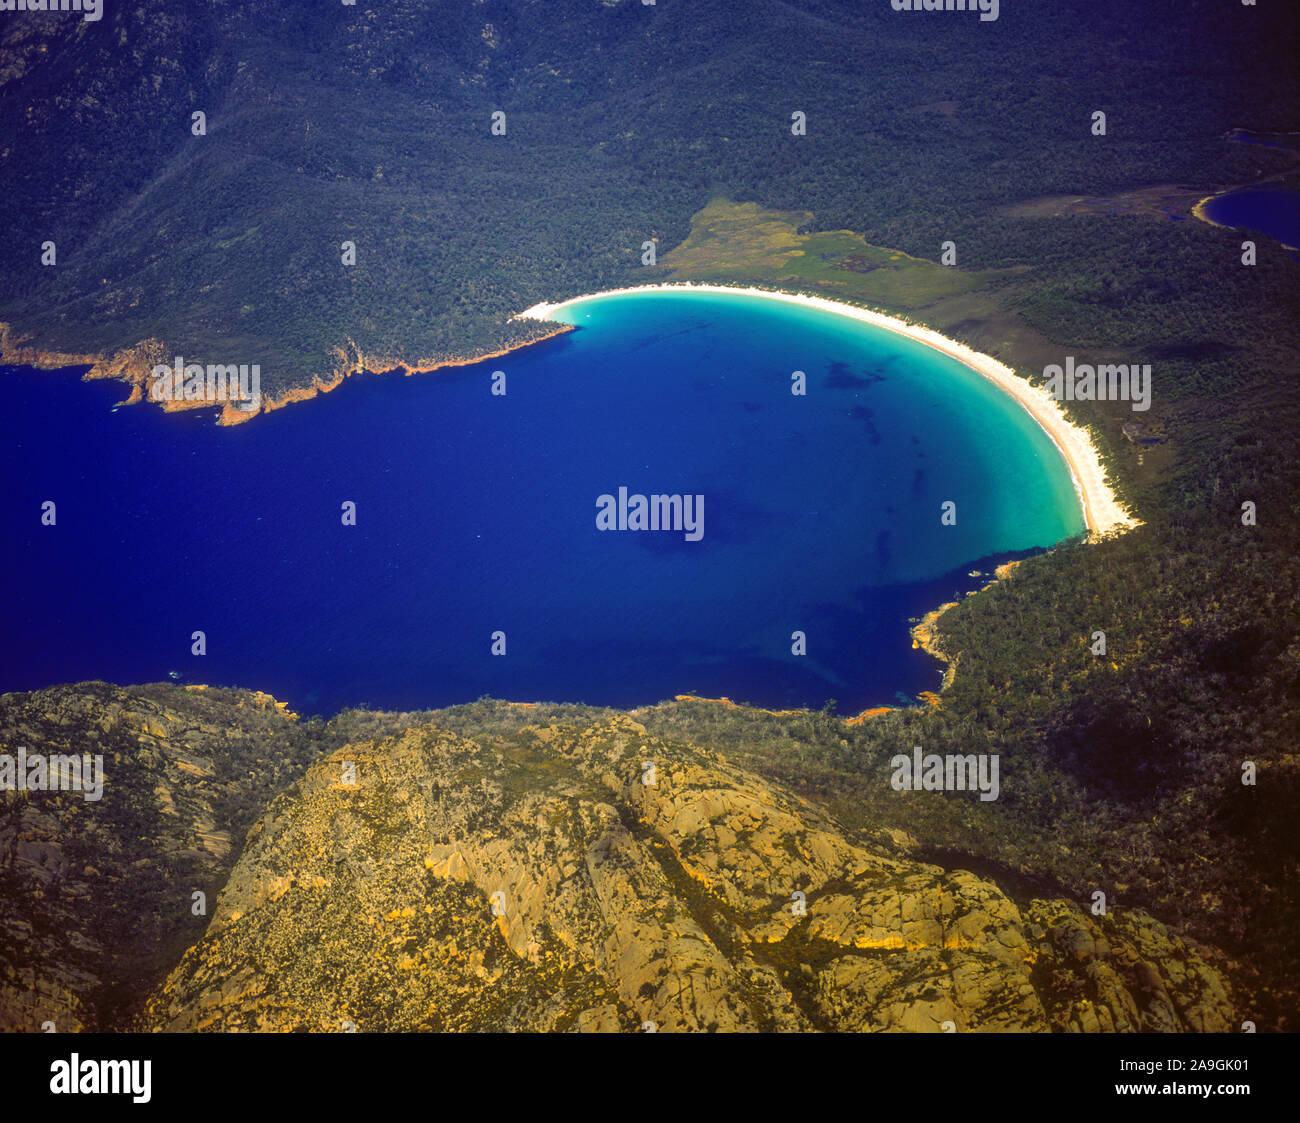 Winegalss Bay View, Freycinet National Park, Tasmania, Australia, Aerial View, Stock Photo